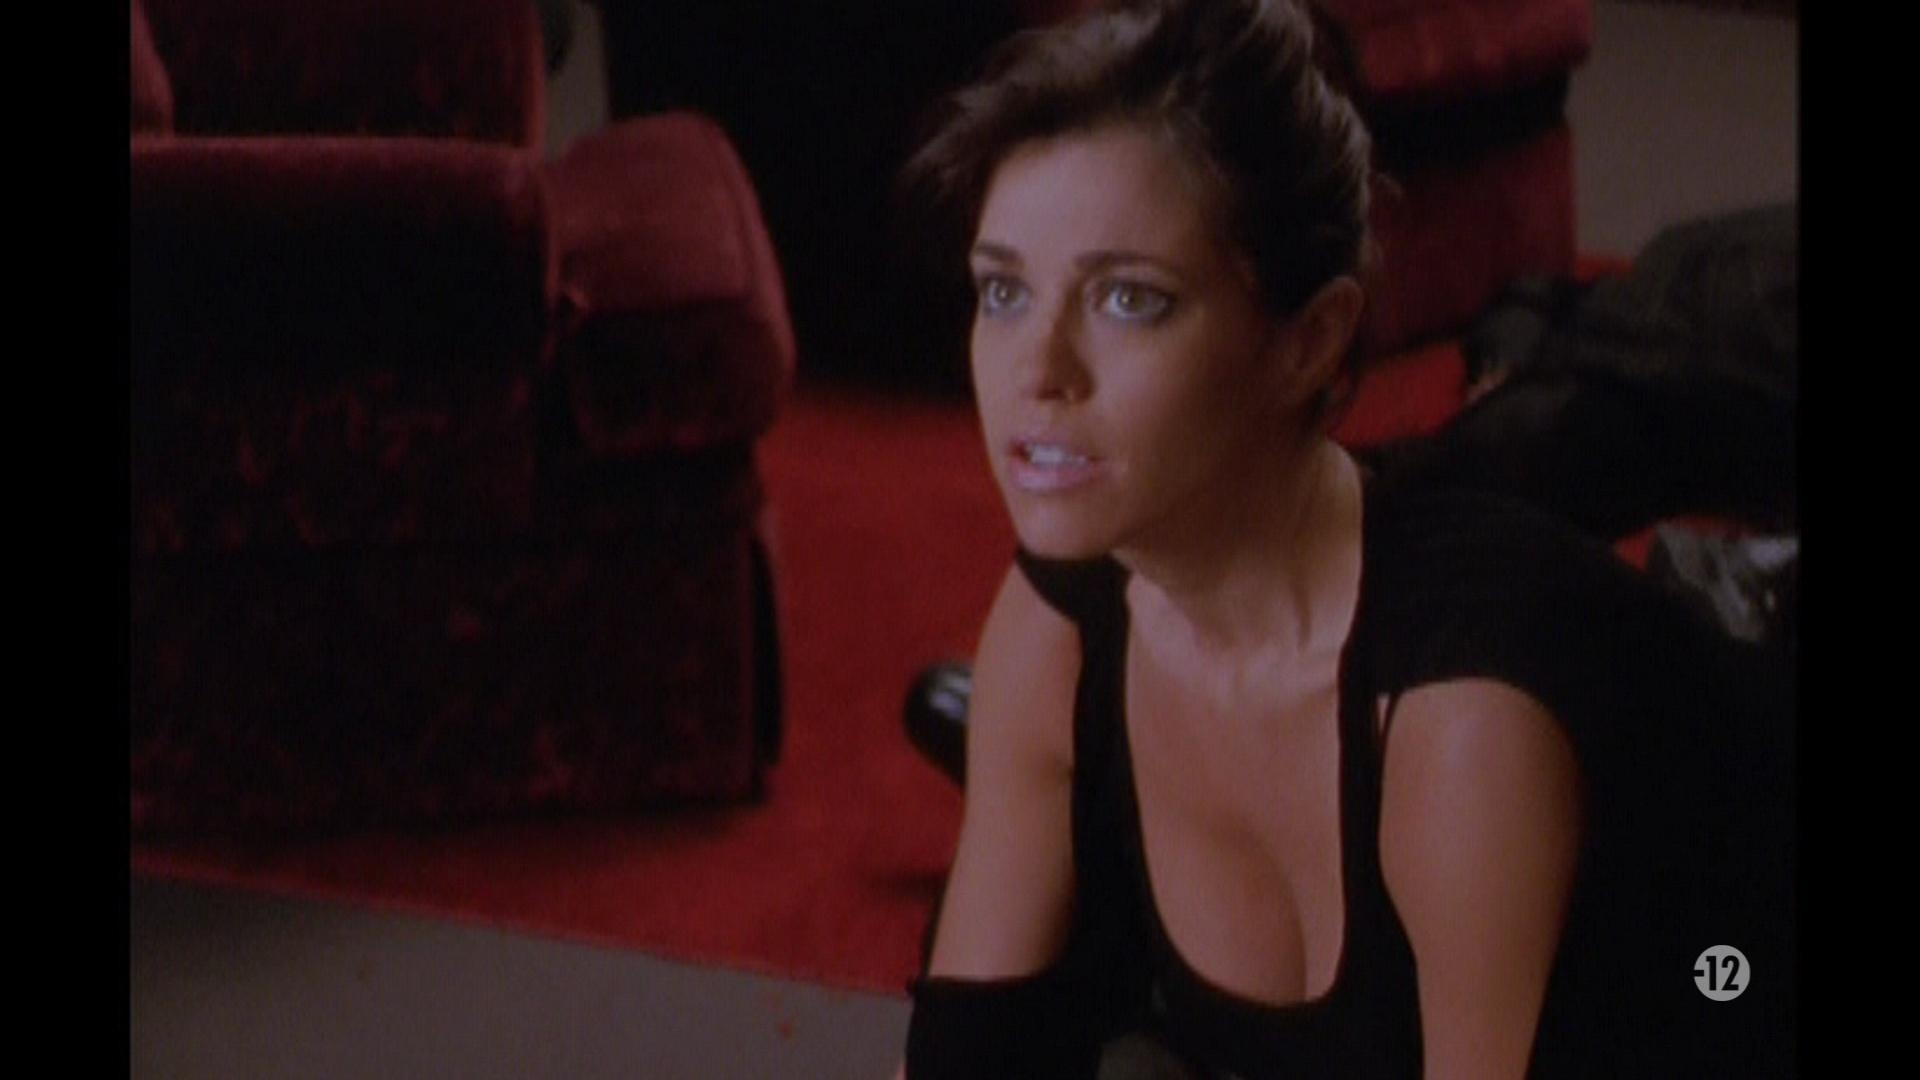 Mia Zottoli in Embrace the Darkness 3 (2002)